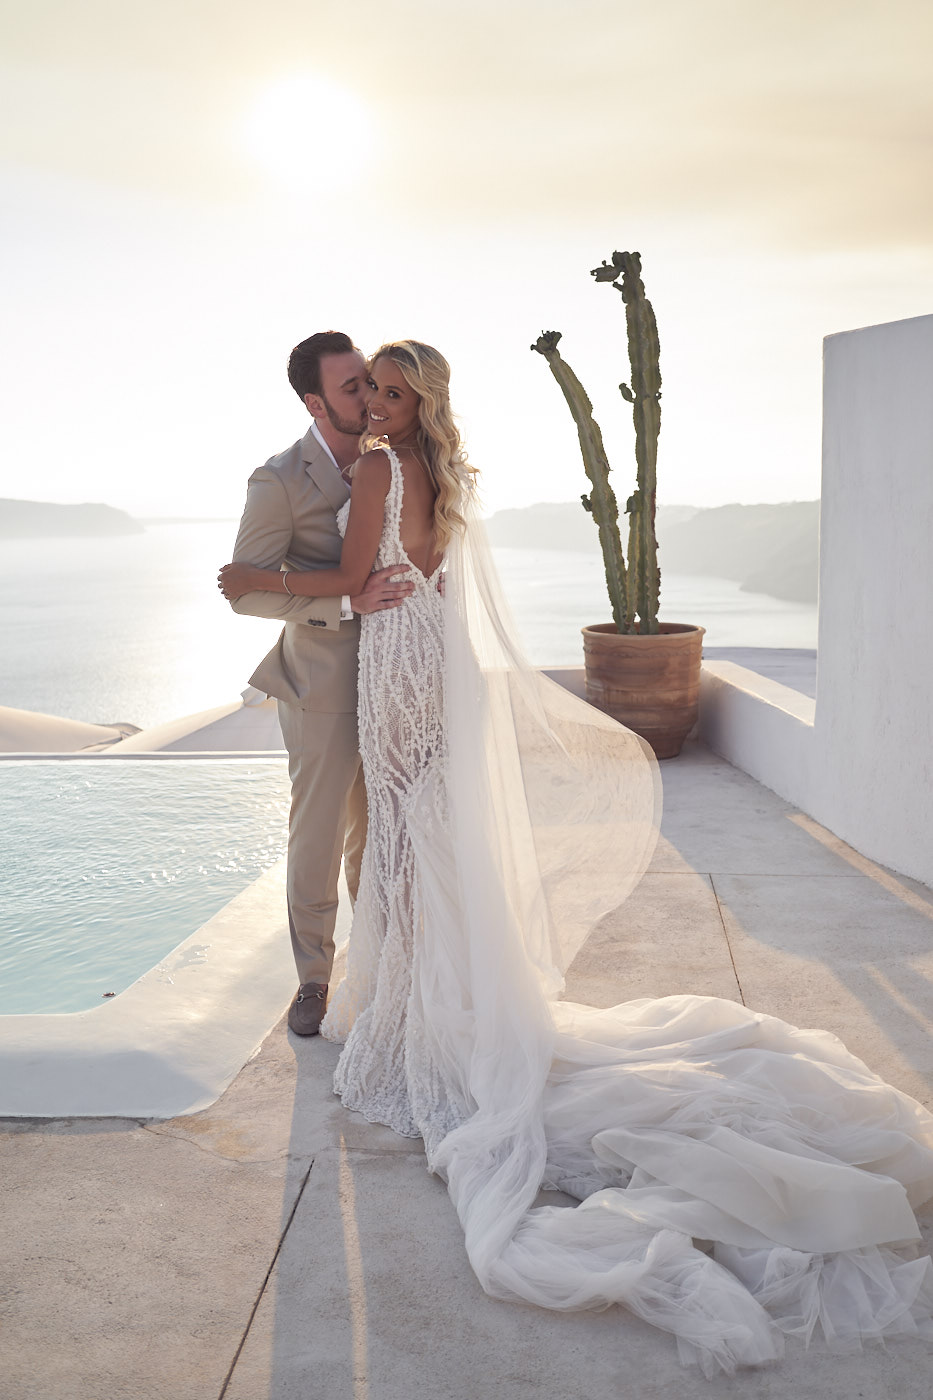 GandJ_santorini-wedding_Lostinlove 109.jpg